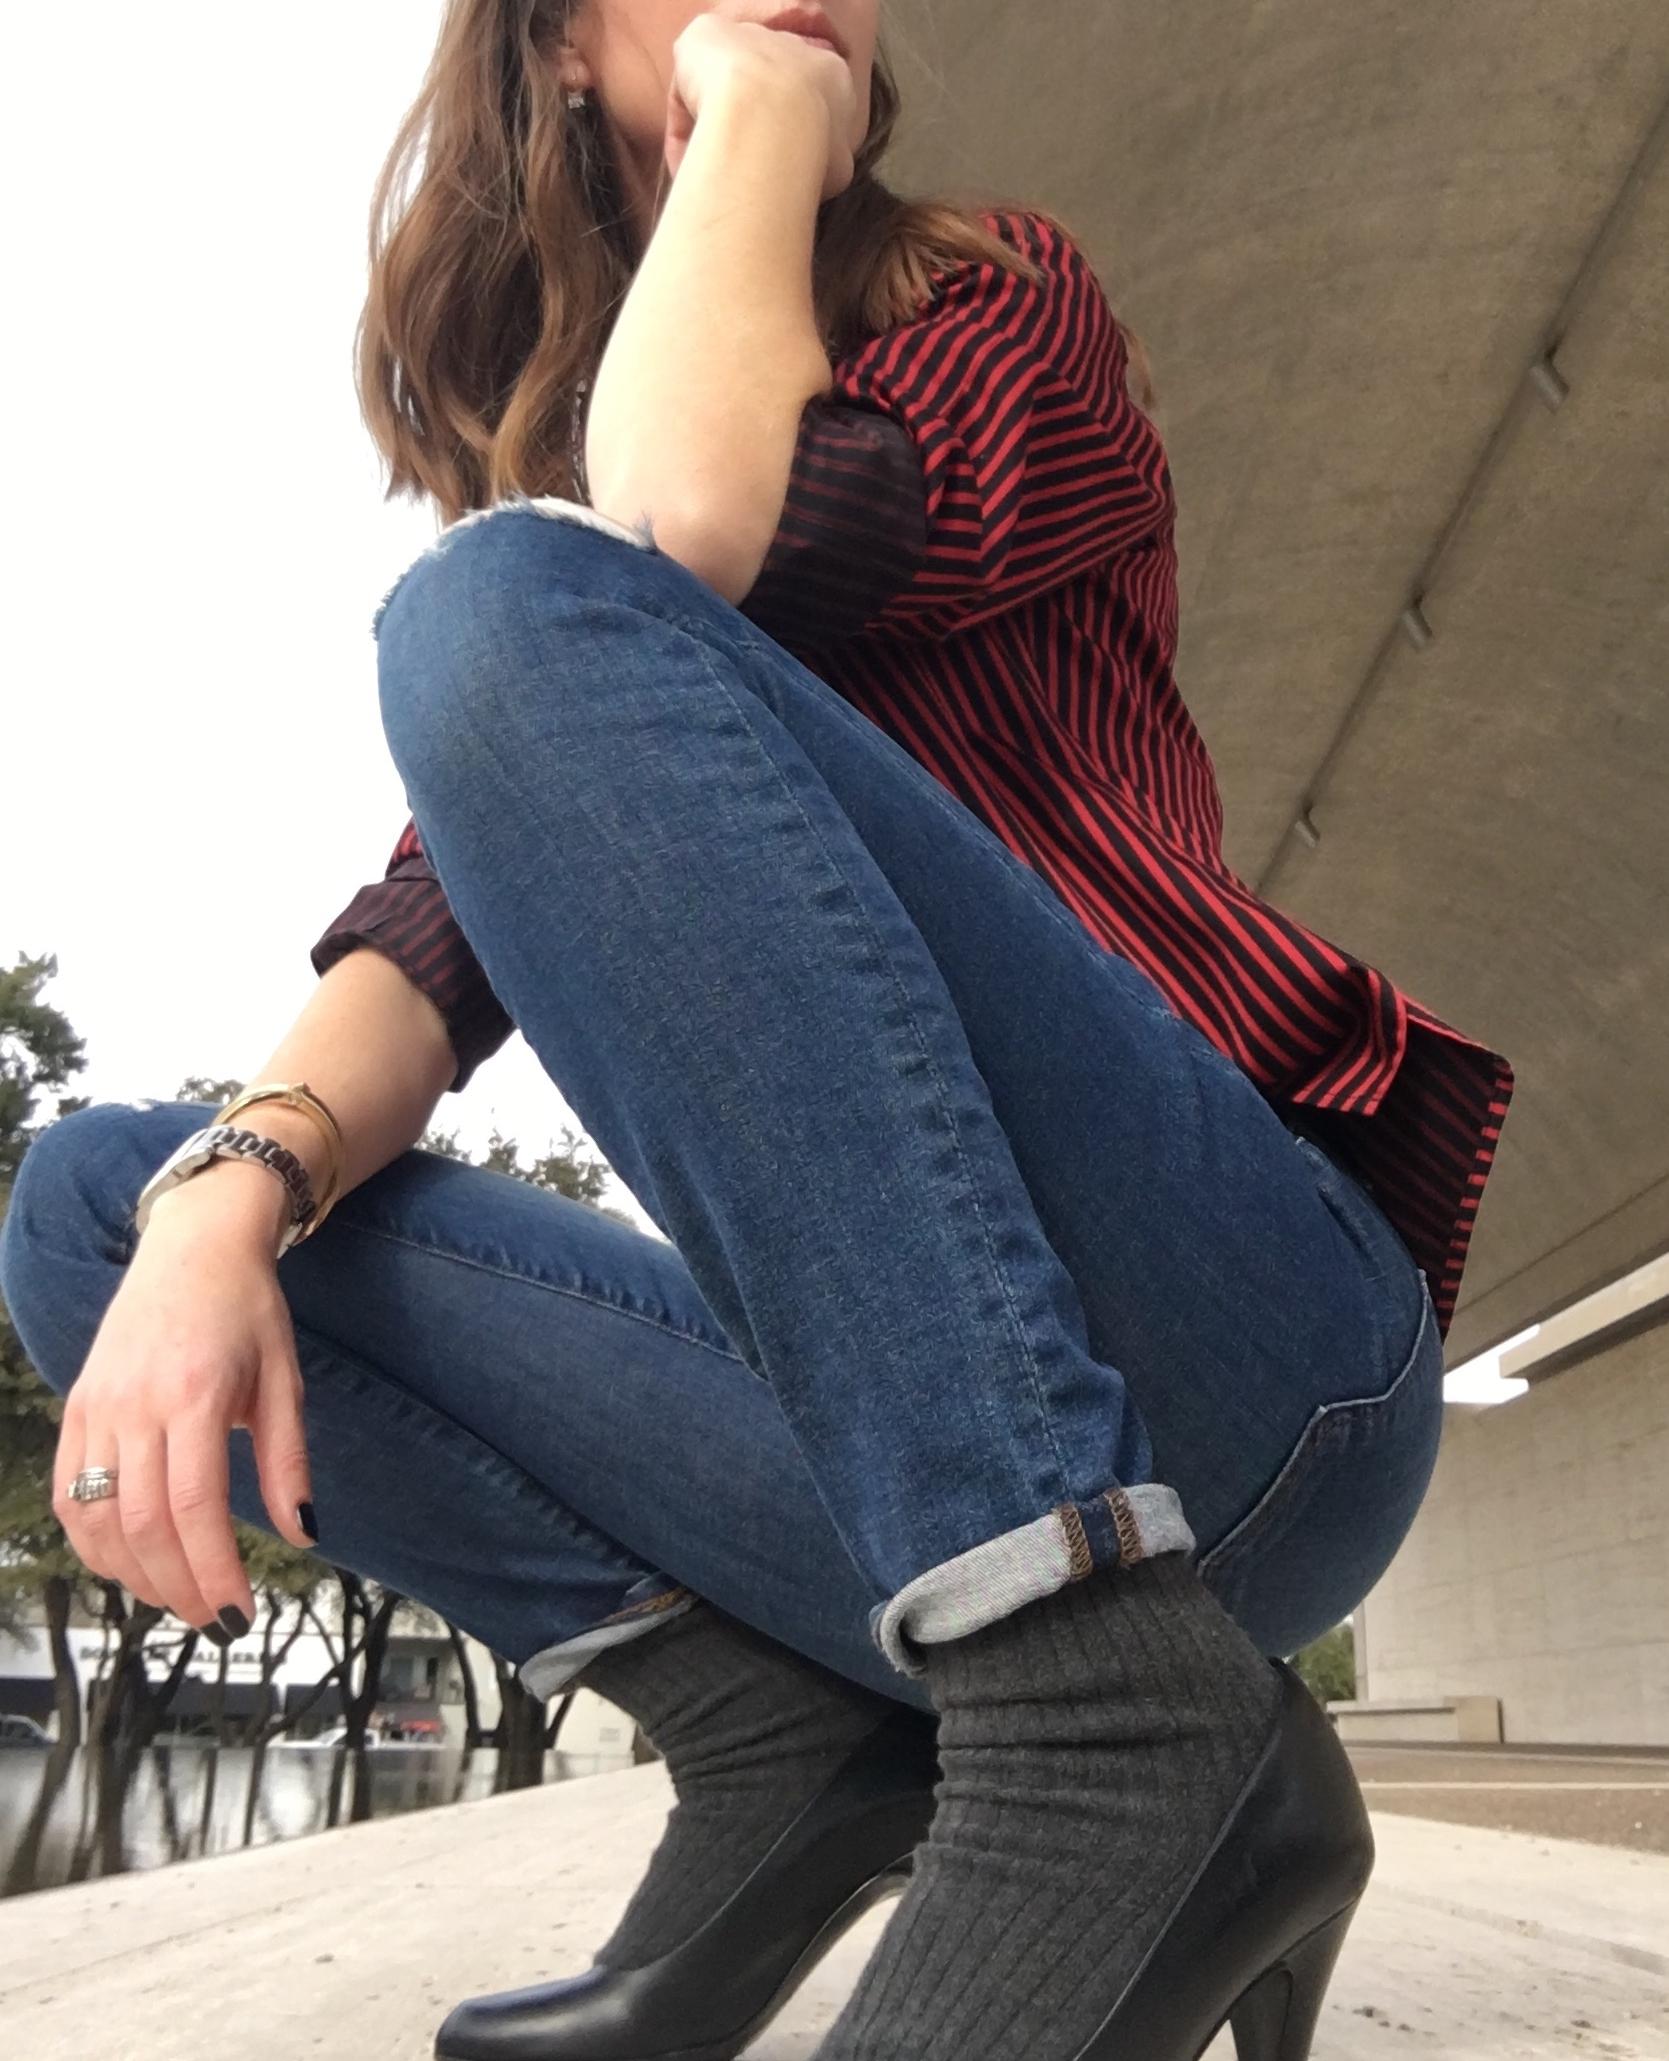 skinny-jeans-and-coach-heels.jpg